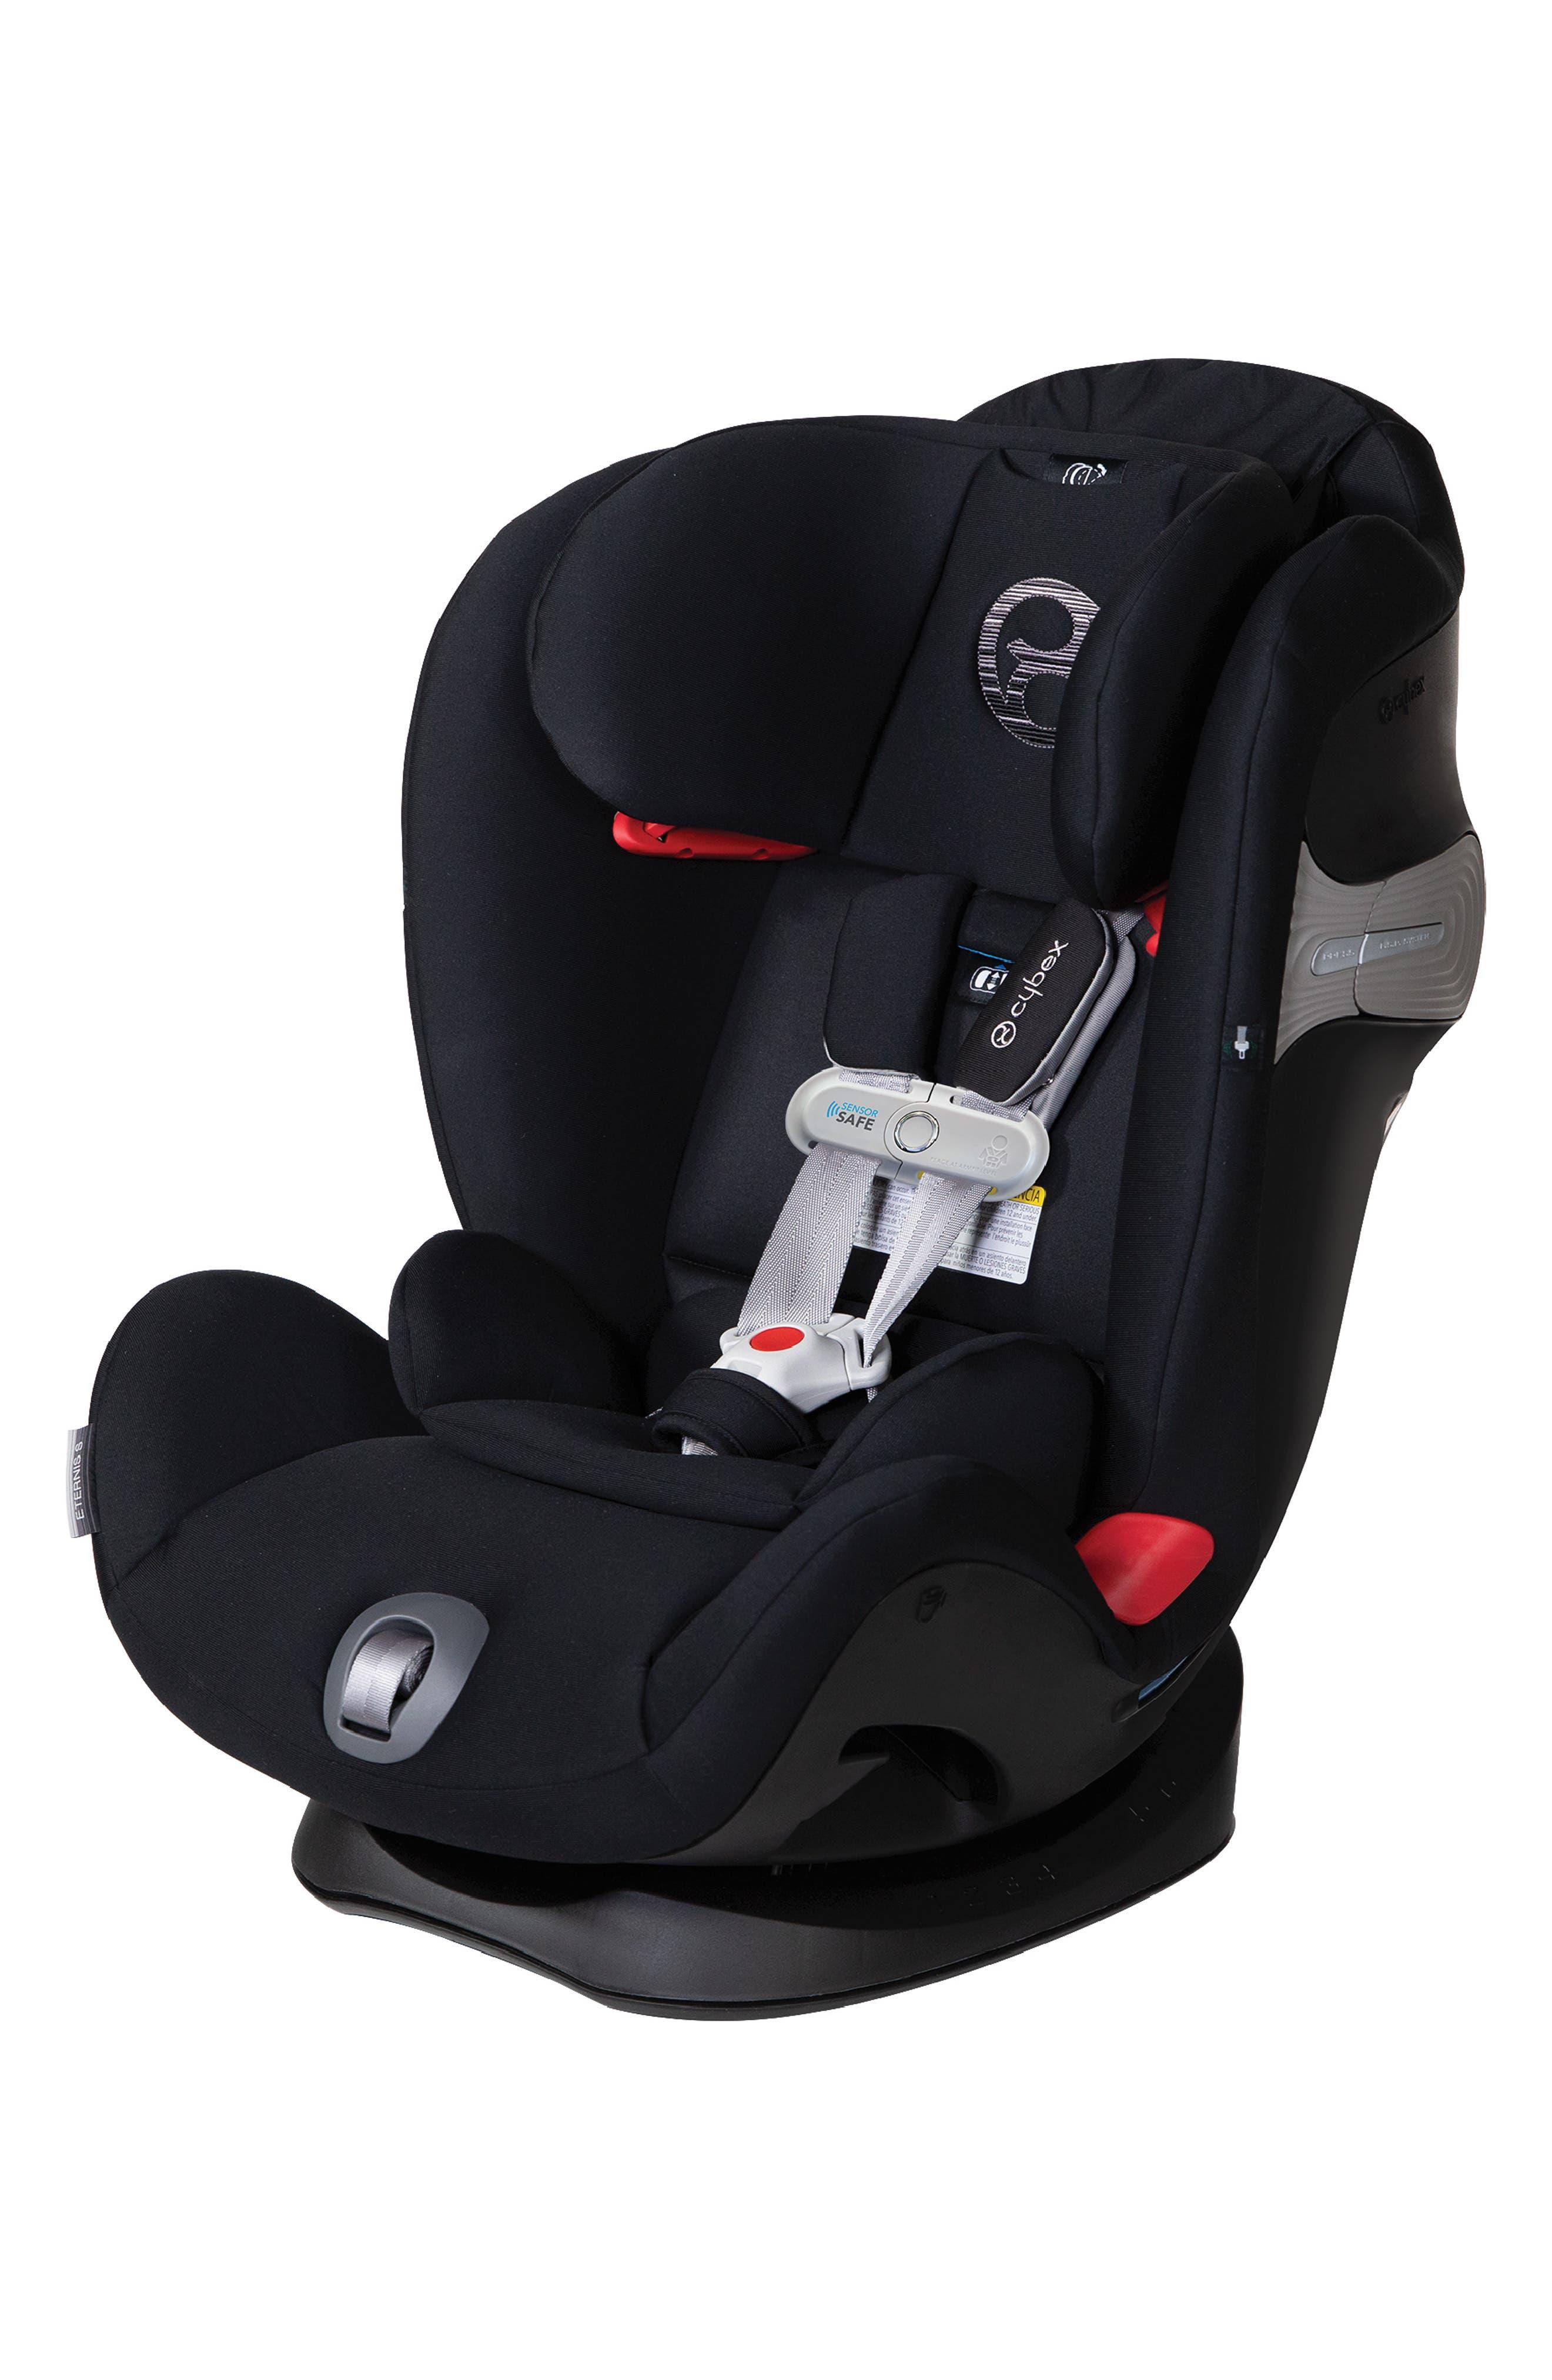 Infant Cybex Eternis S Sensorsafe(TM) AllInOne Car Seat Size One Size  Black